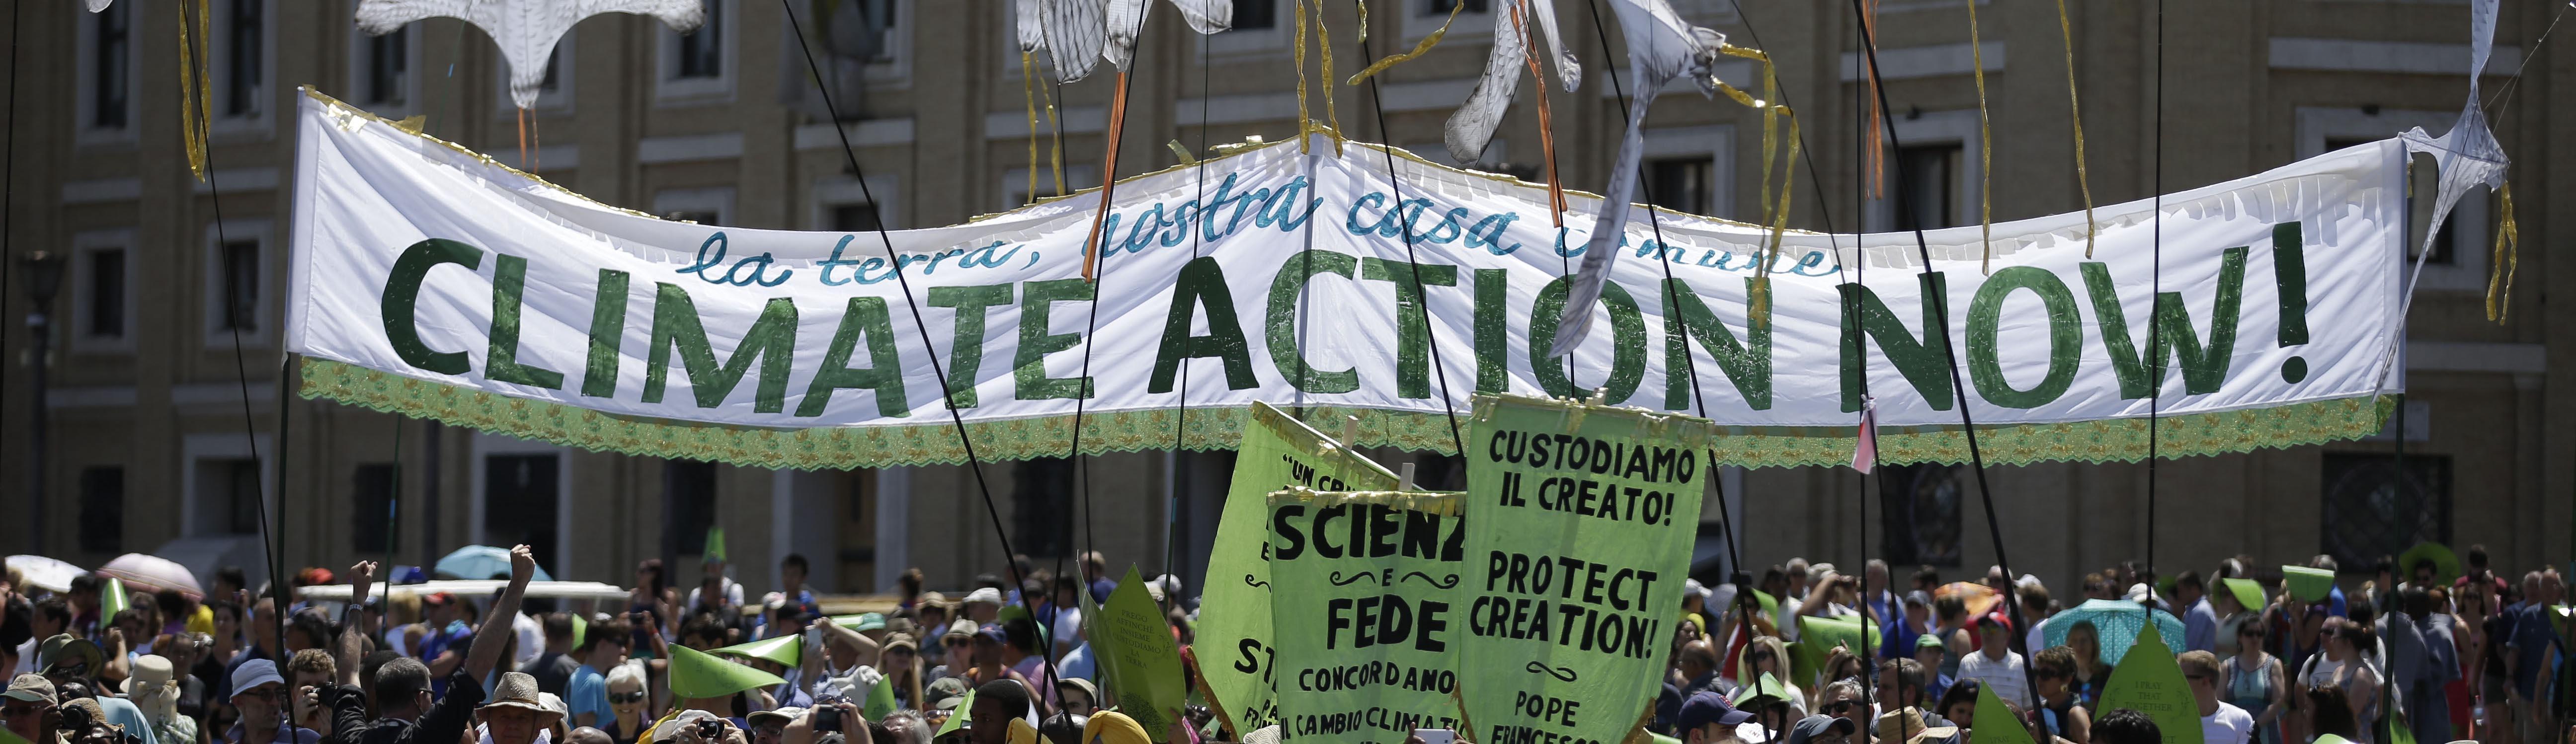 Manifestazione per l'ambiente, Piazza San Pietro, papa Francesco